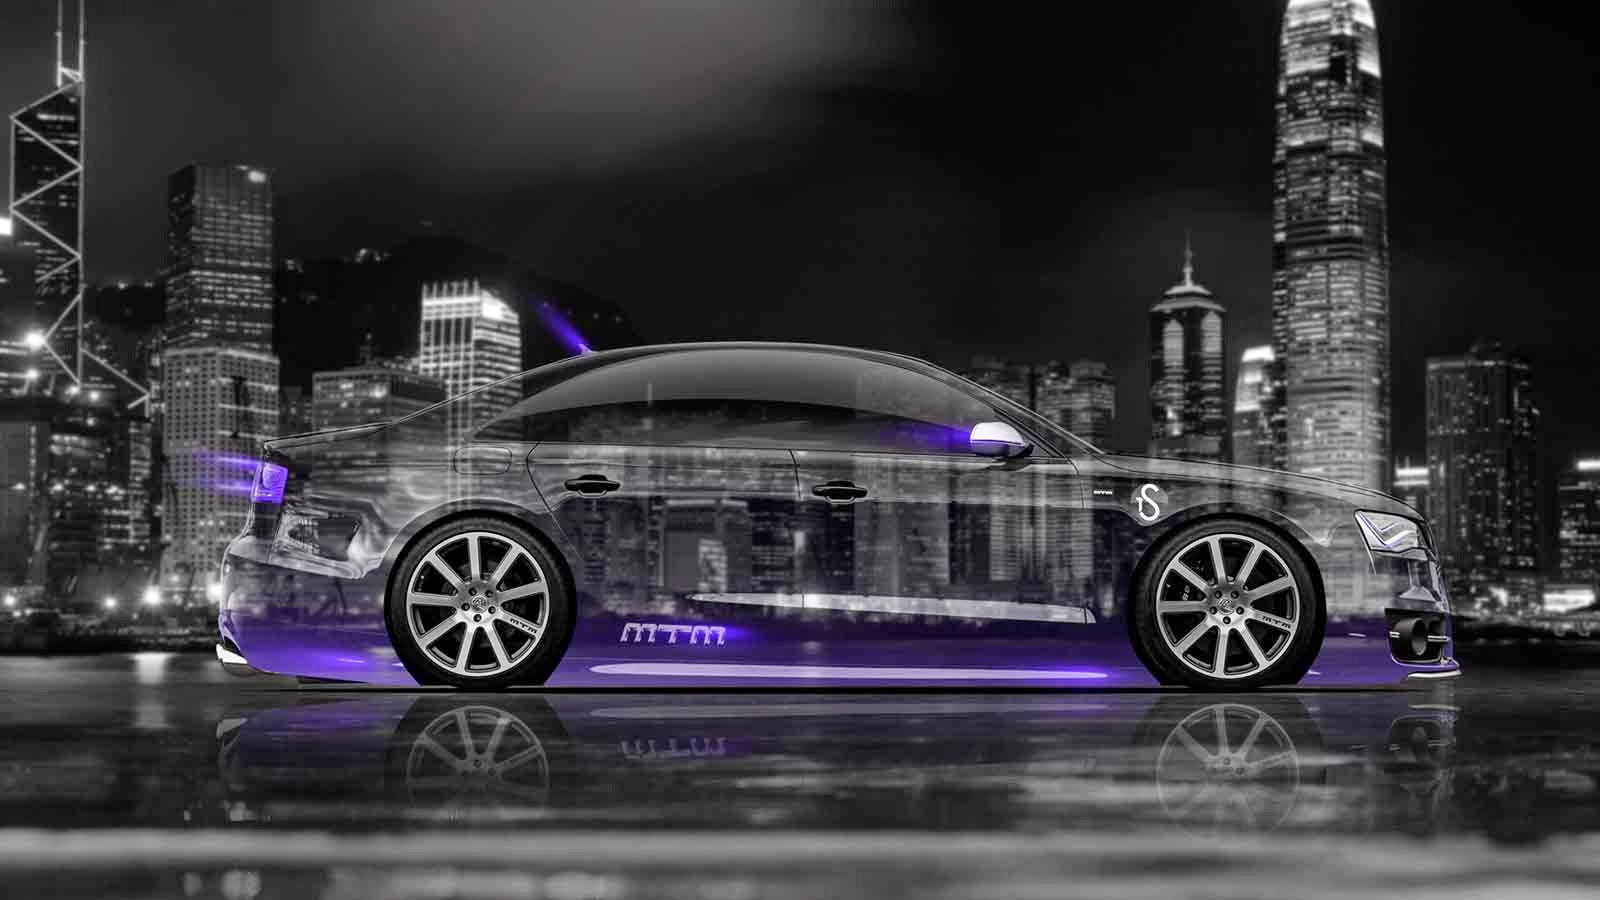 Imagenes De Fondos De Carros Como Fondos Imagenes De Autos: Imagenes De Carros Modificados Para Fondo De Pantalla Imagui